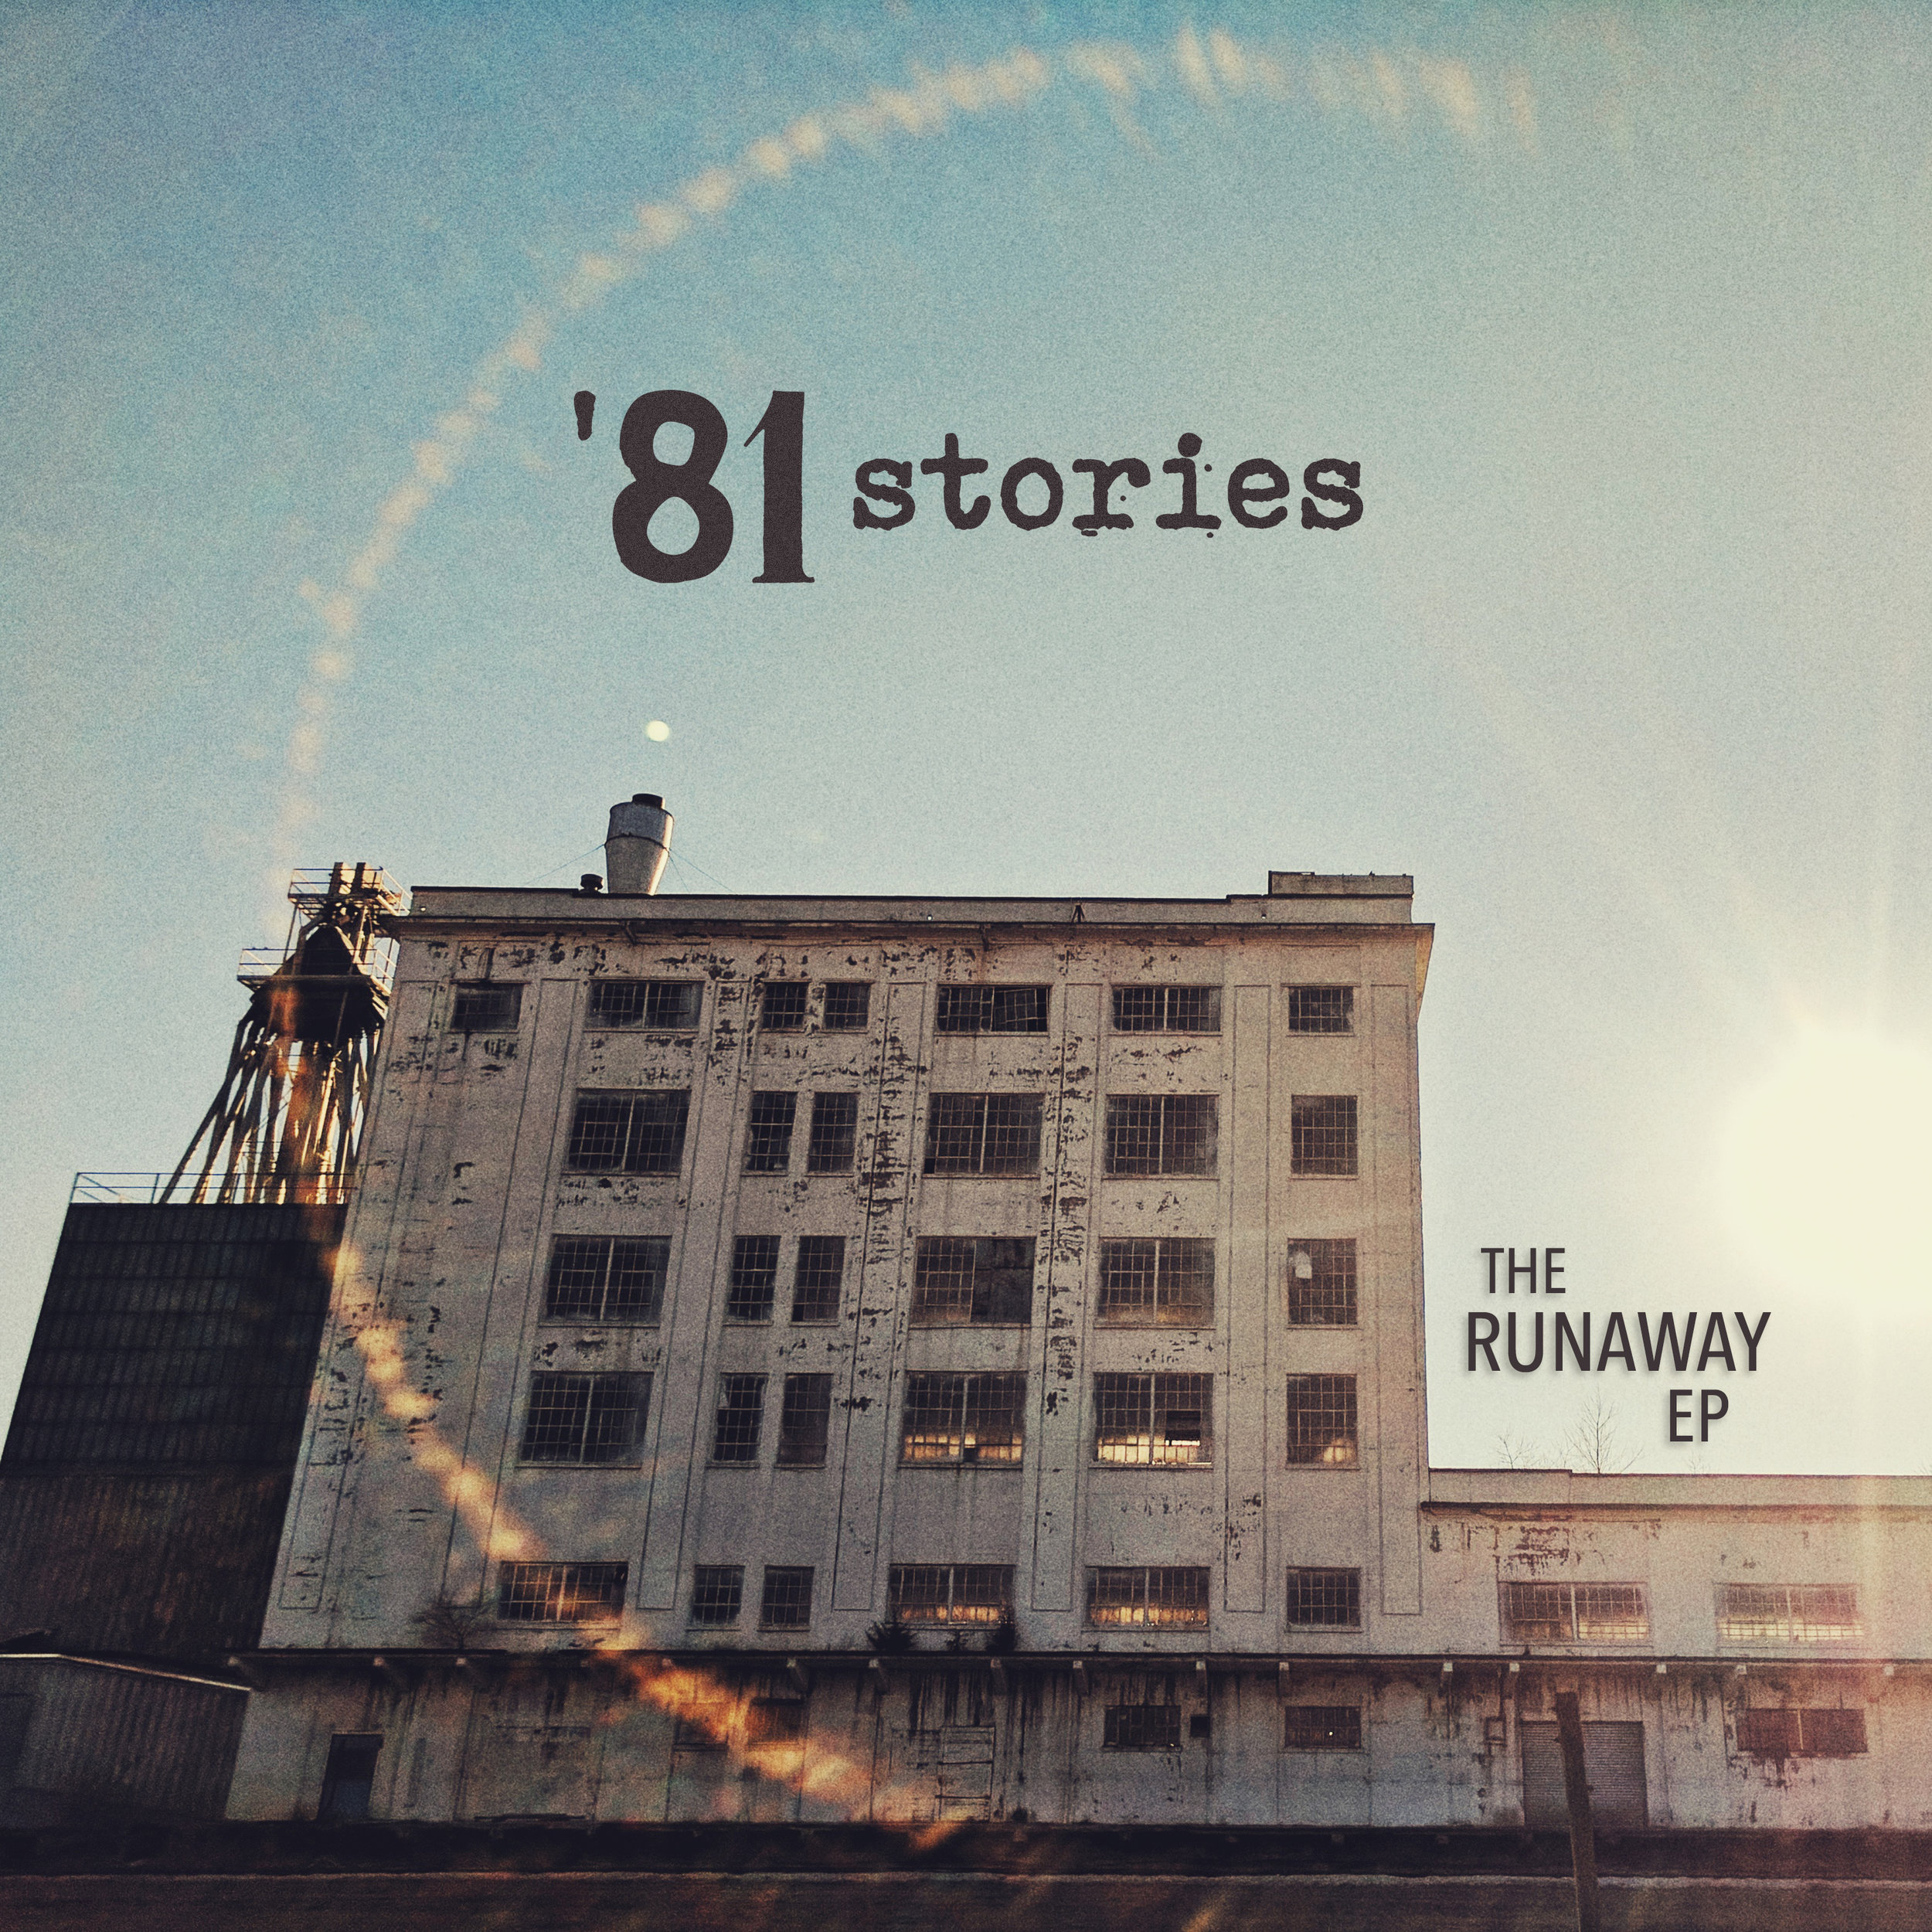 81_Stories_Runaway_EP_Artwork_7.16_v2.jpg